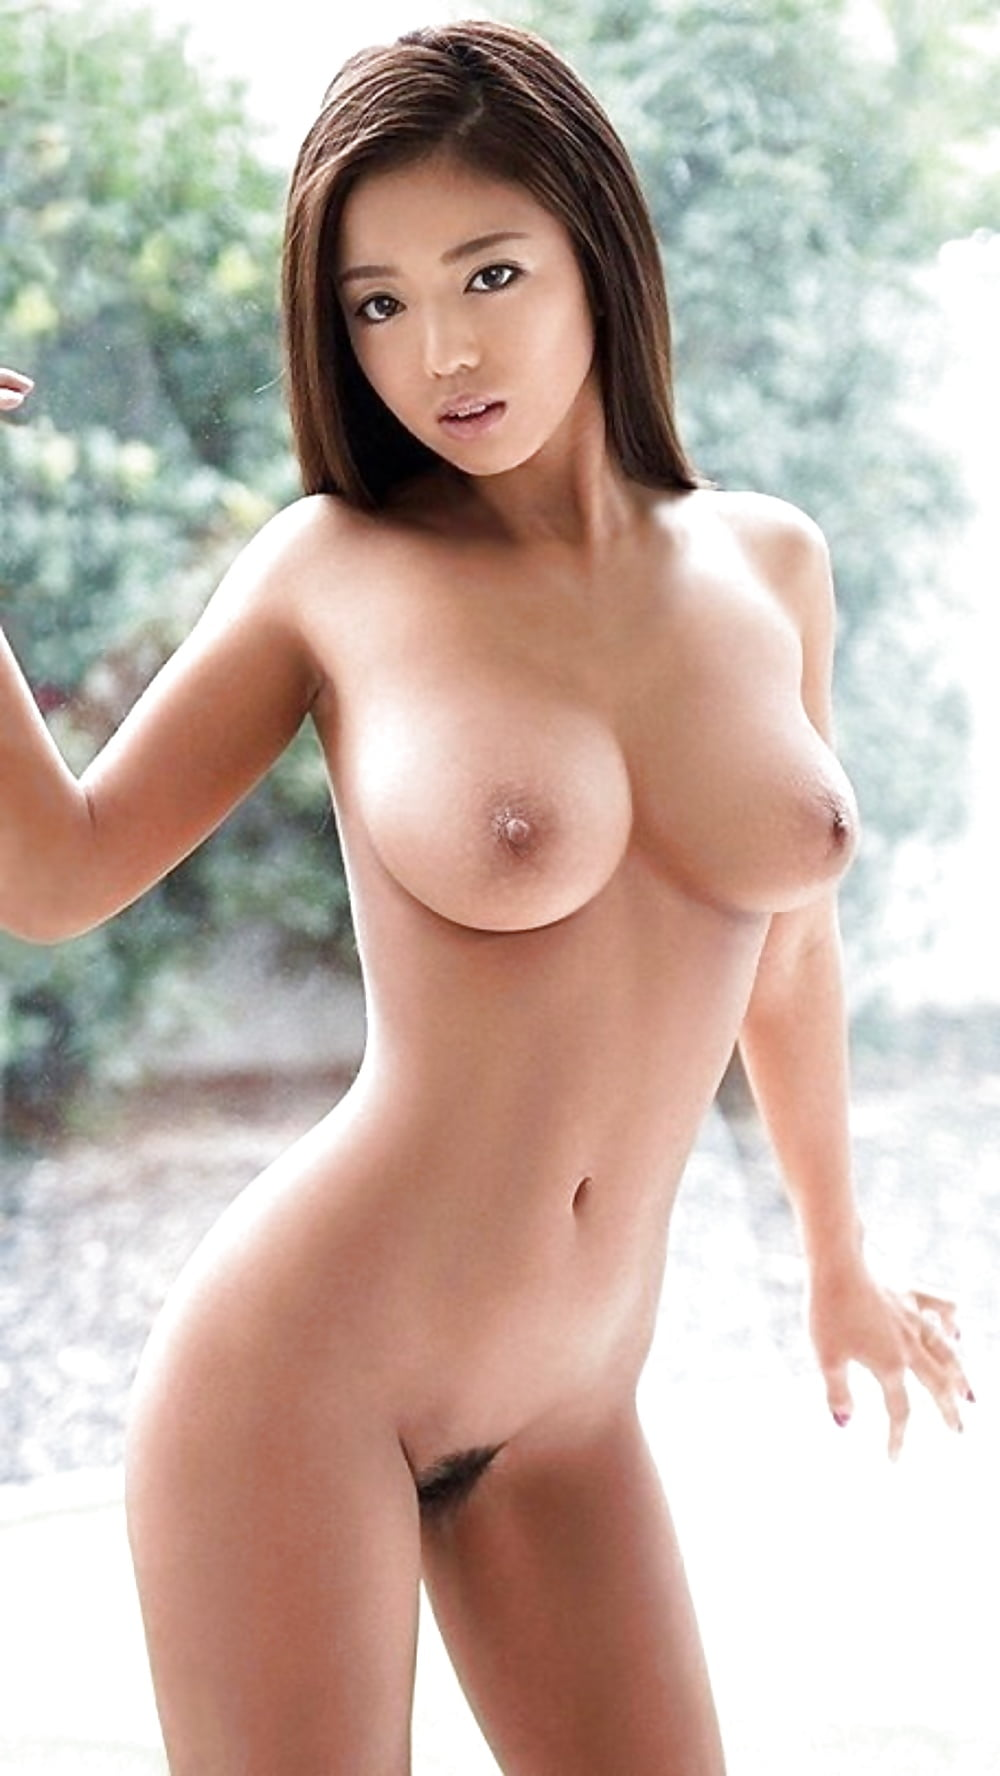 Hot Asian Girl Big Tits